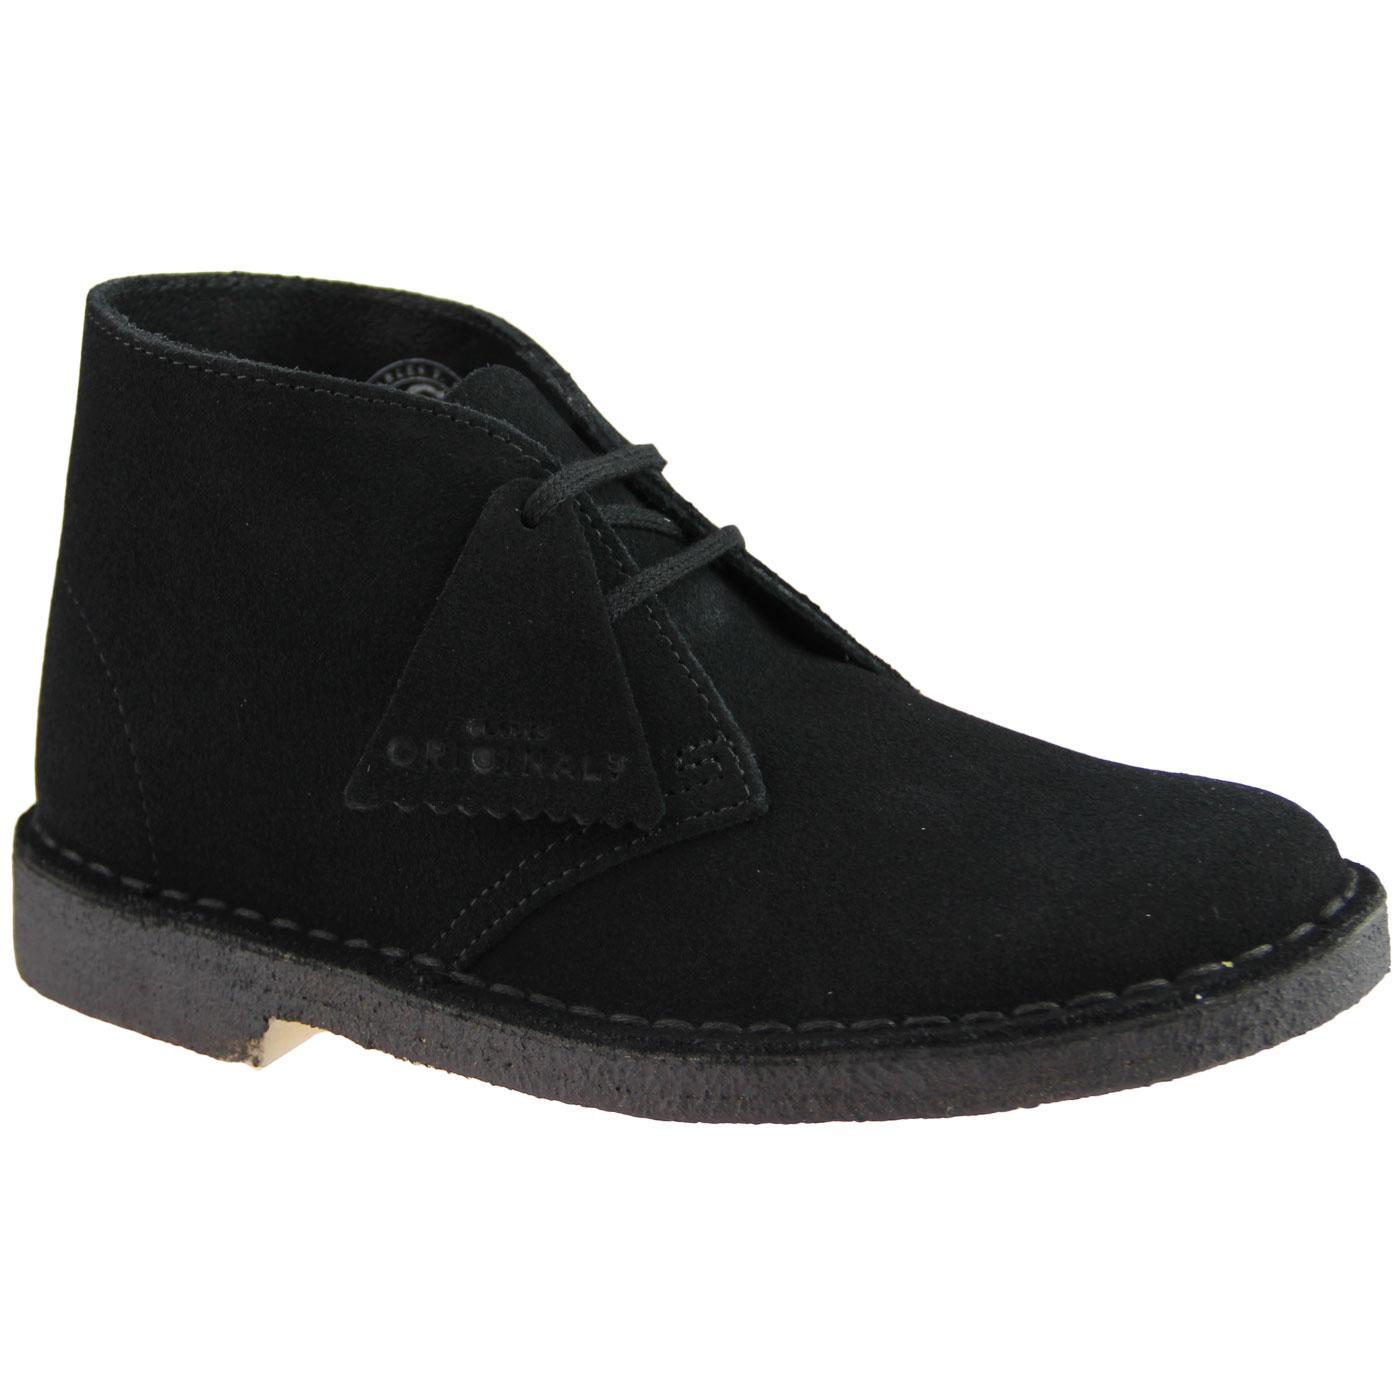 Desert Boots CLARKS ORIGINALS Women's Boots Black